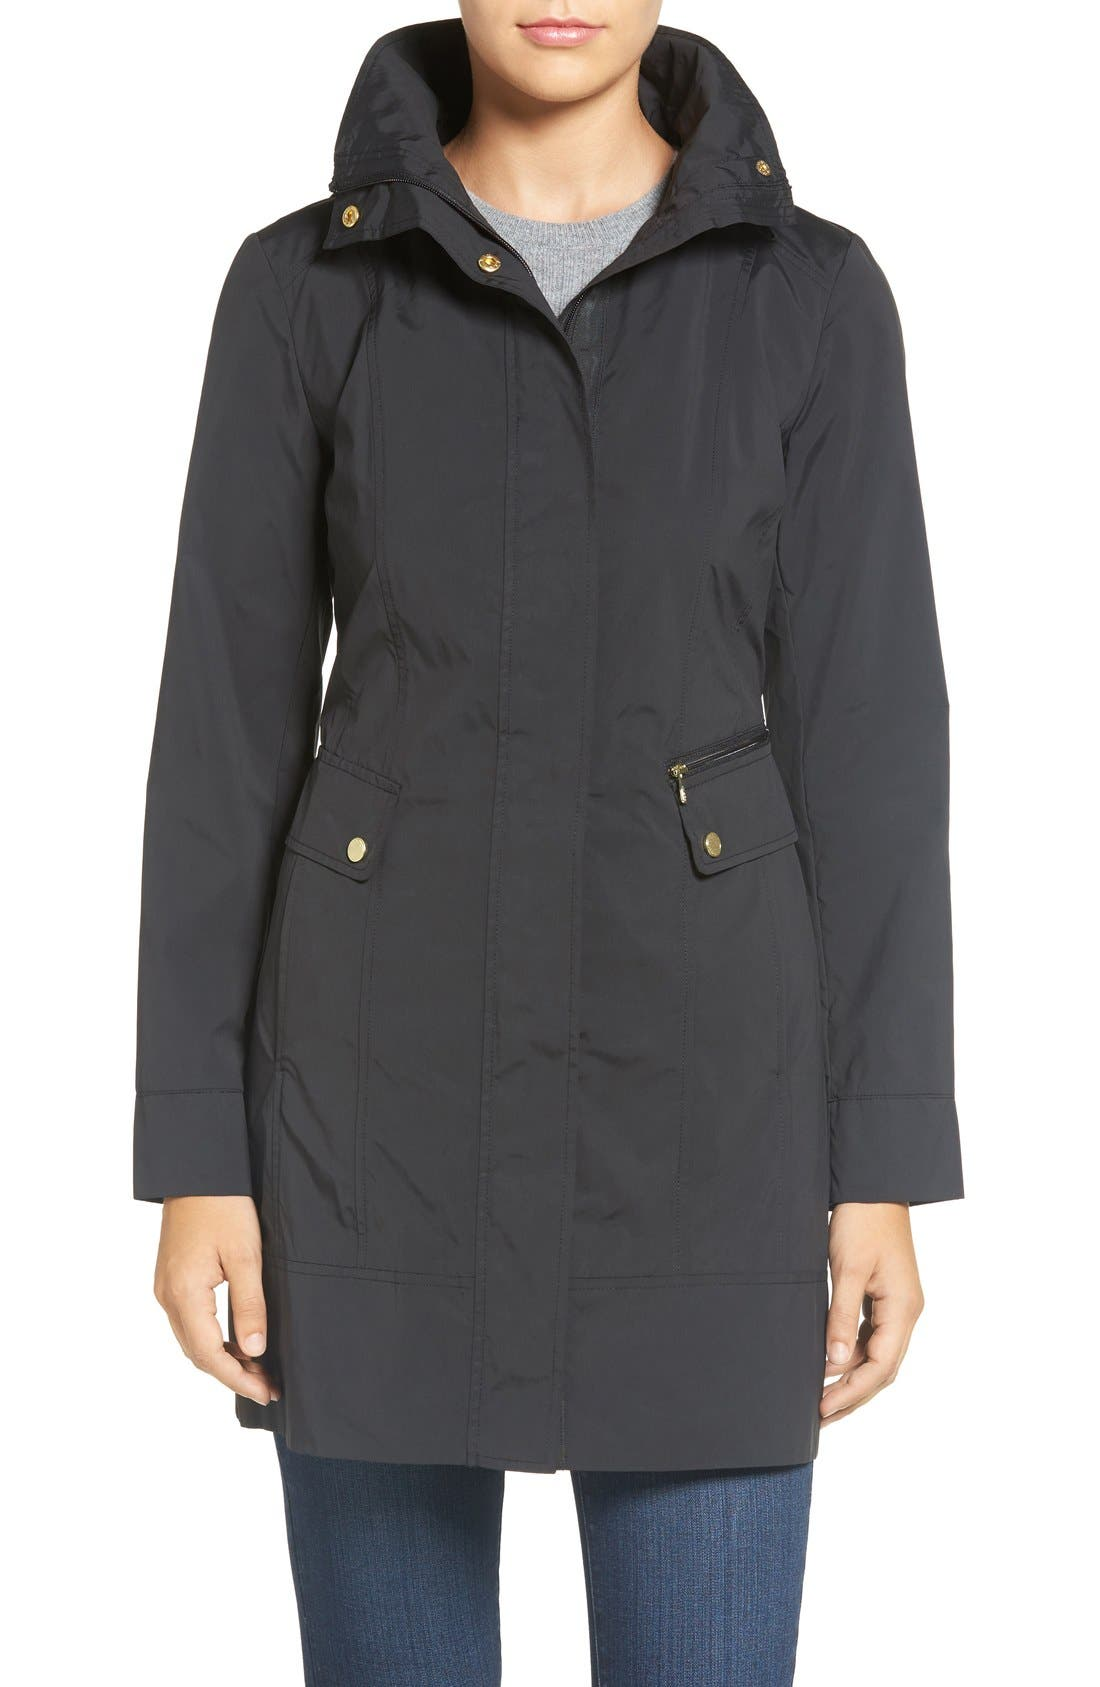 Back Bow Packable Hooded Raincoat,                             Main thumbnail 1, color,                             BLACK